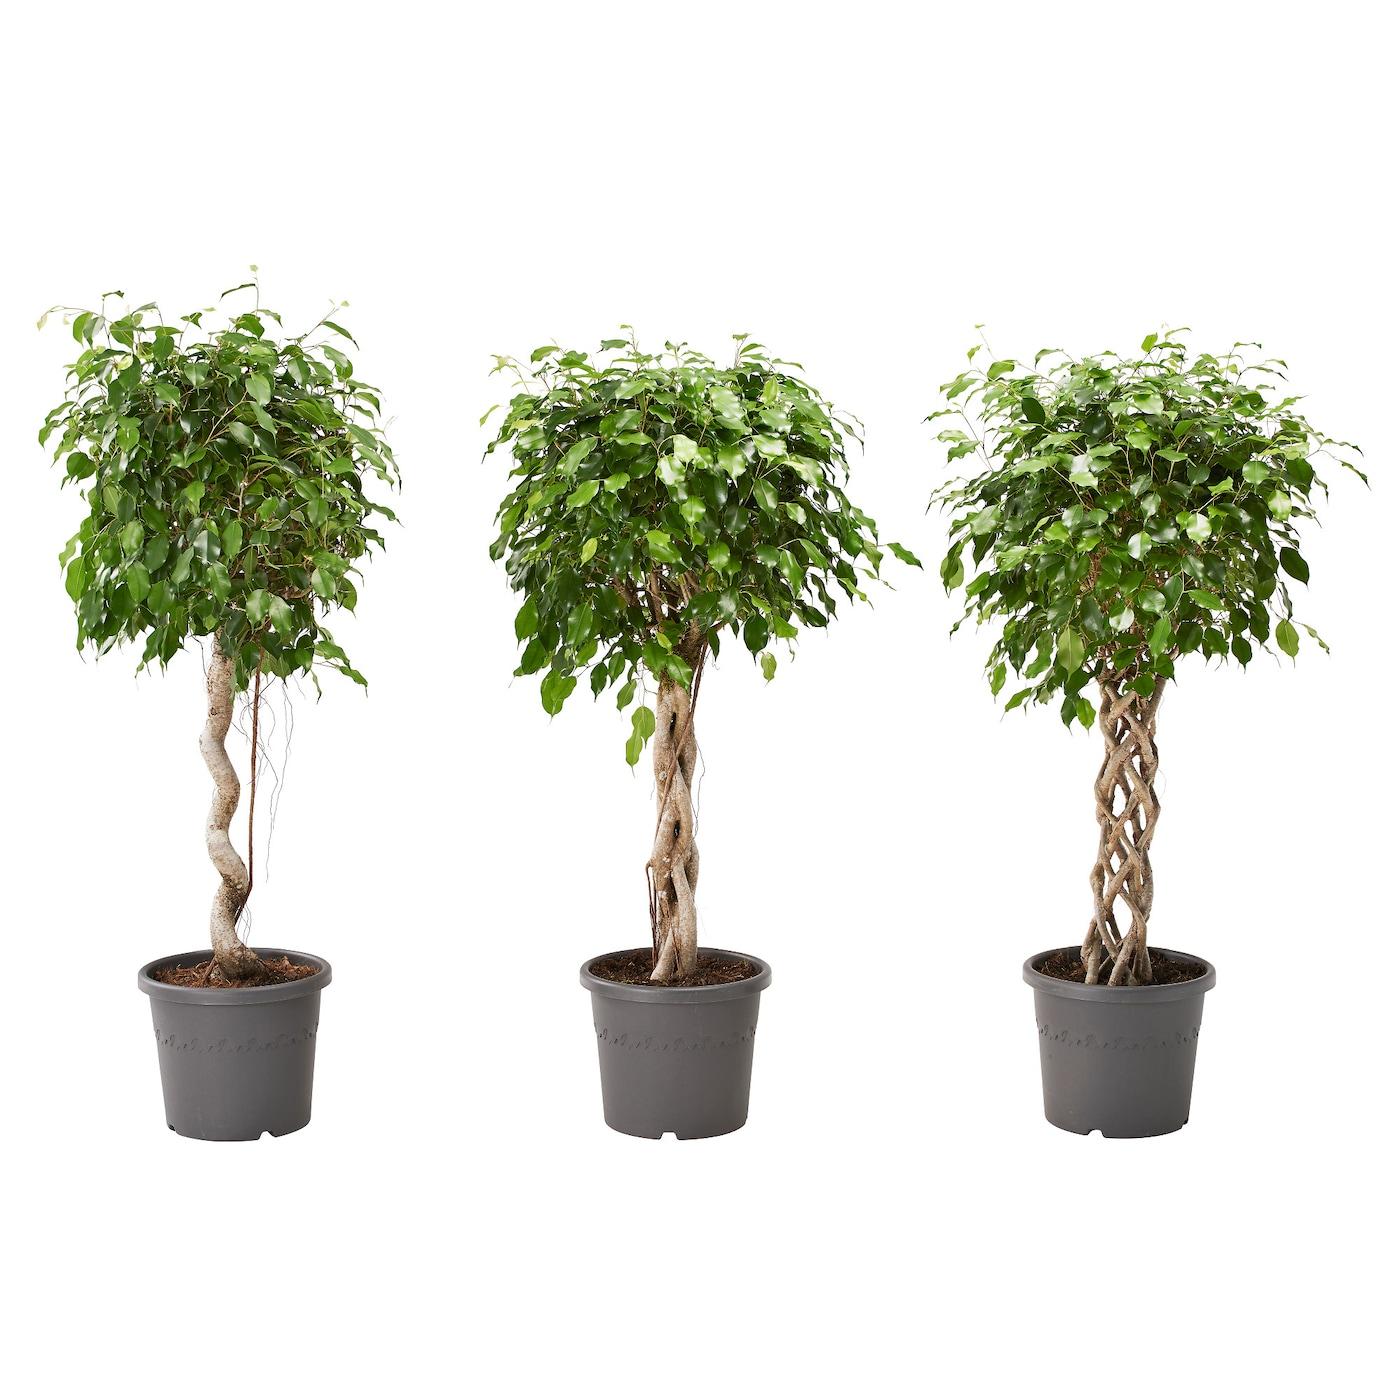 FICUS BENJAMINA Pflanze - Ficus grünlaubig/versch. Arten 16 cm